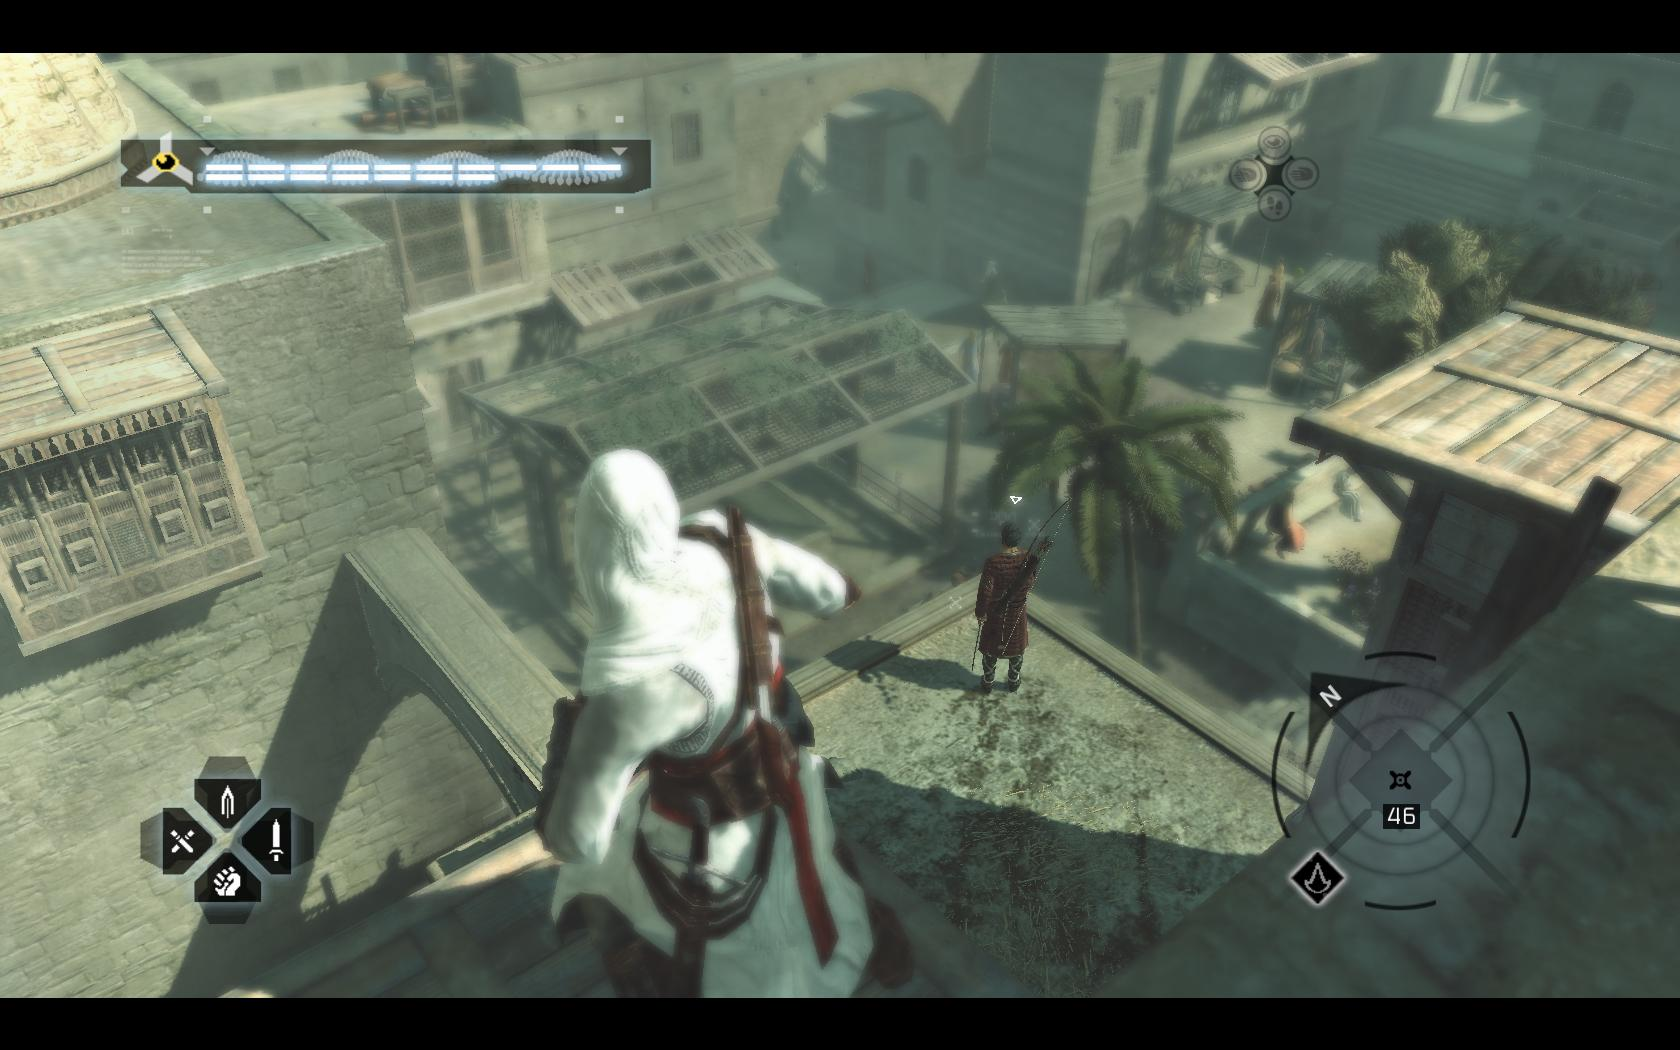 assassinscreed_dx10_2008_04_17_20_16_29_50